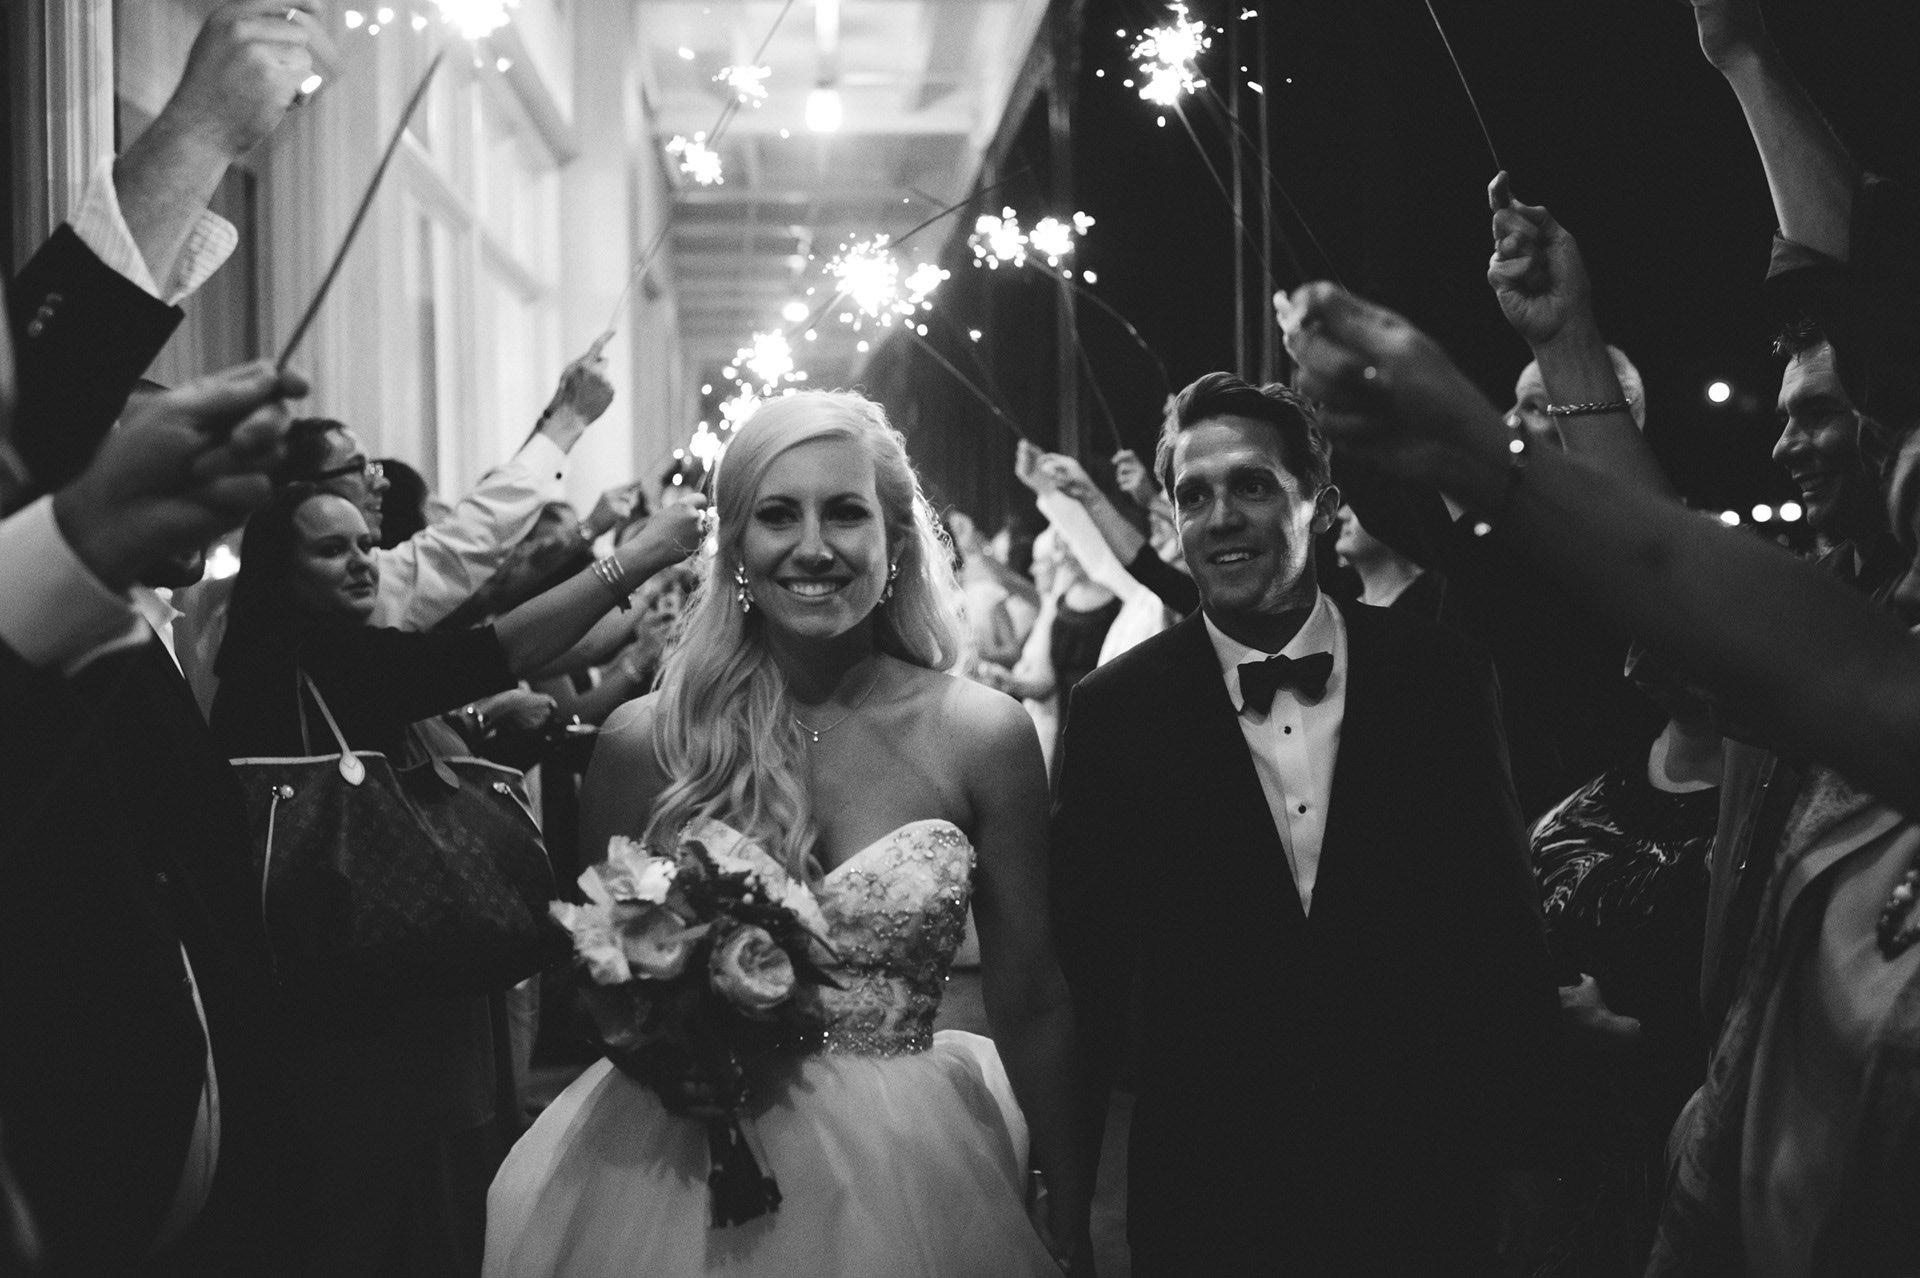 St-Augustine-Wedding-Venues-White-Room-Sparkler-Exit